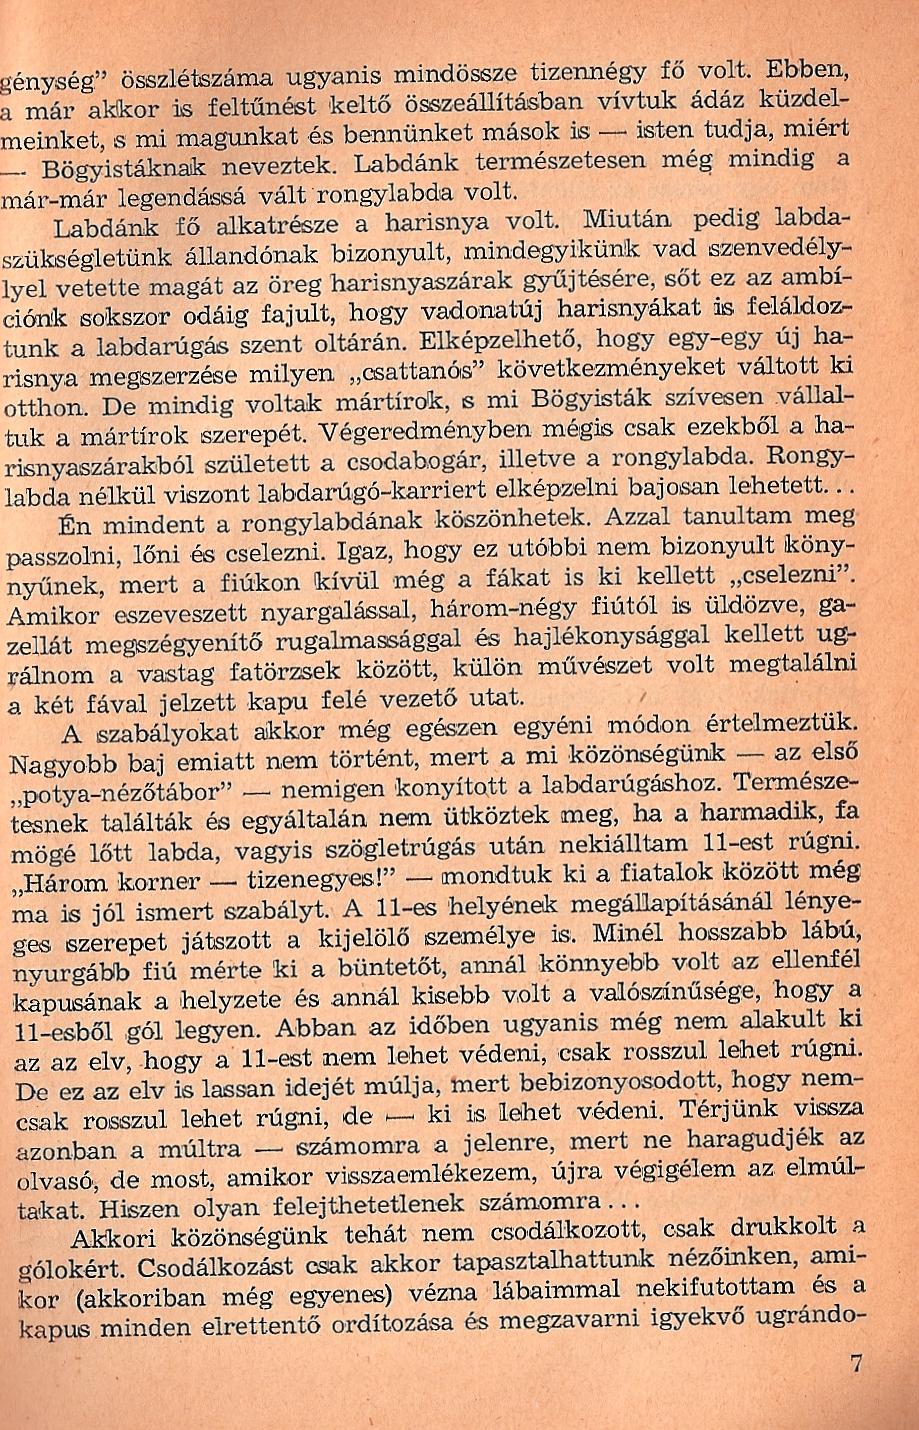 schlosser_fel-evszazad_1957_05_0903